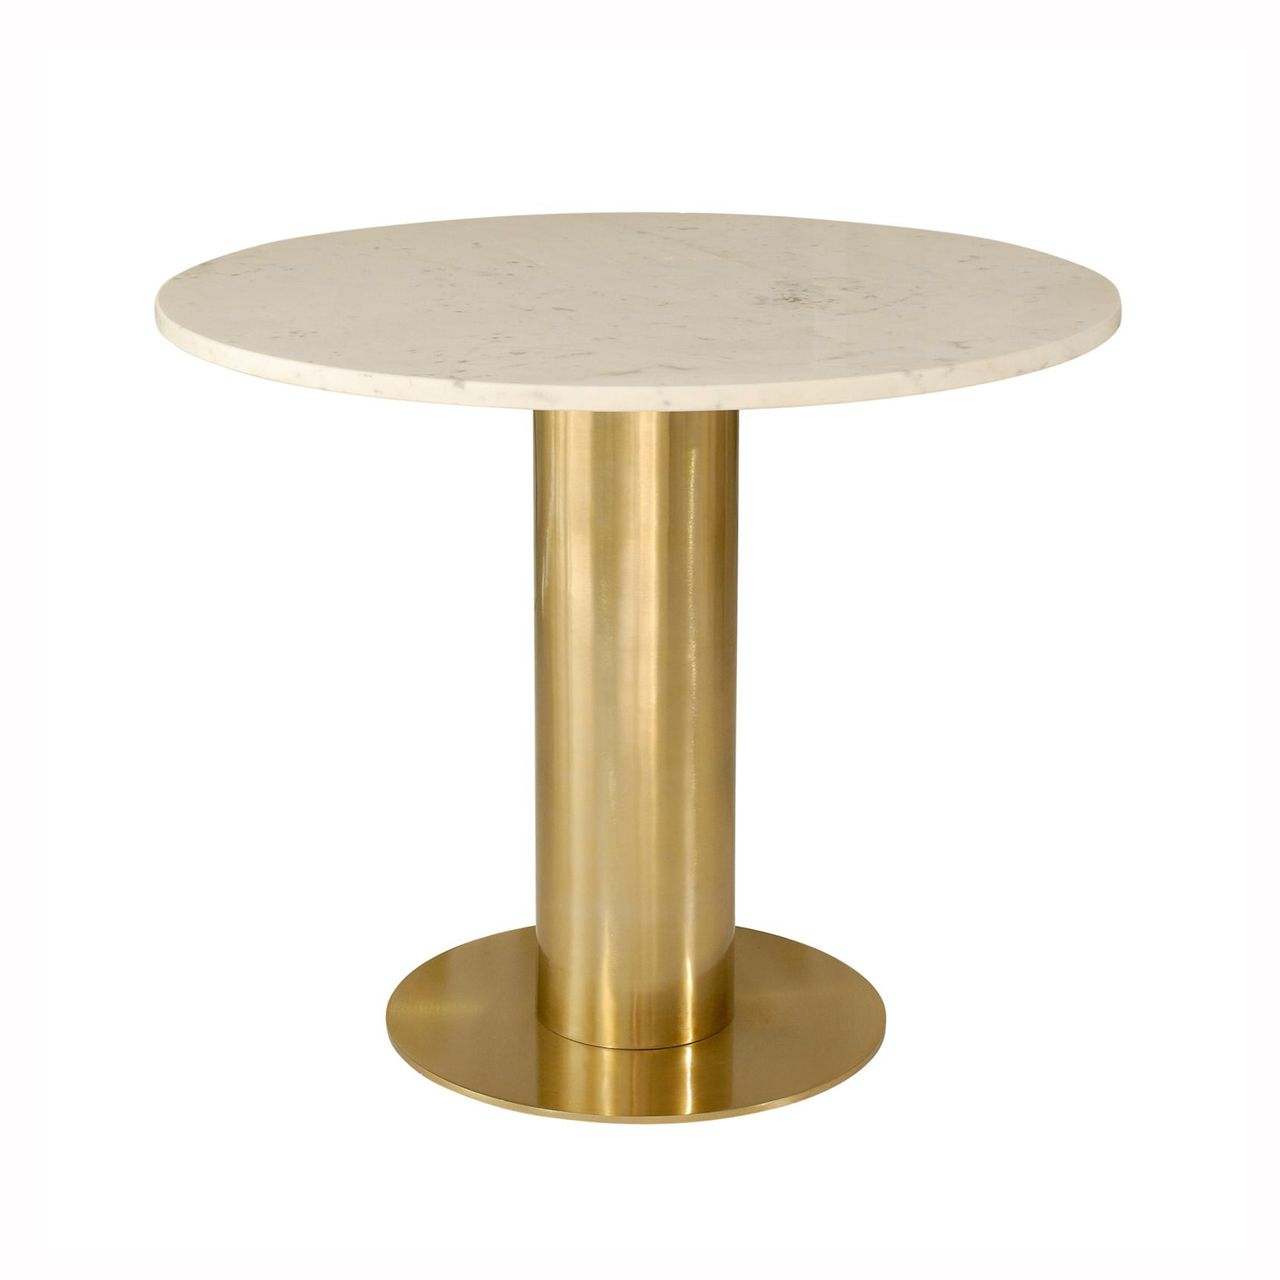 Tom Dixon Screw Table & Tube Base @ Pieces | Sculptural Regarding Most Current Dixon 29'' Dining Tables (View 8 of 15)